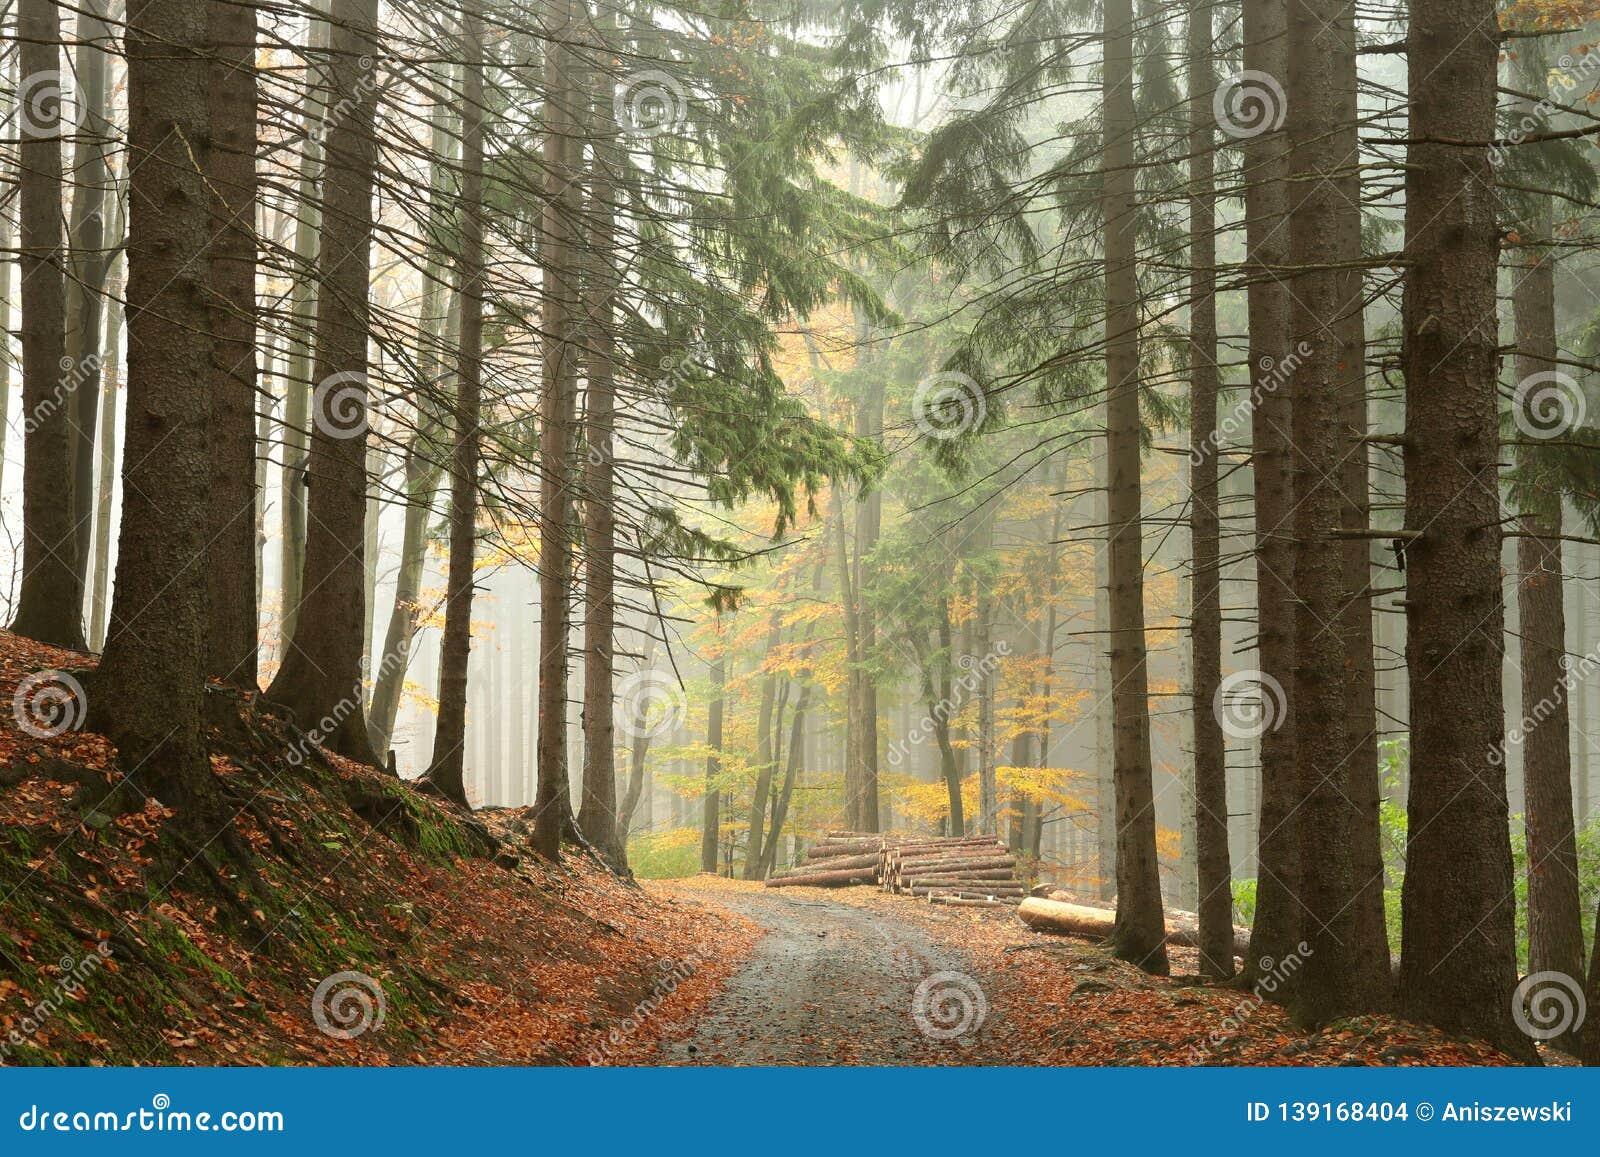 Trail through the misty autumn forest